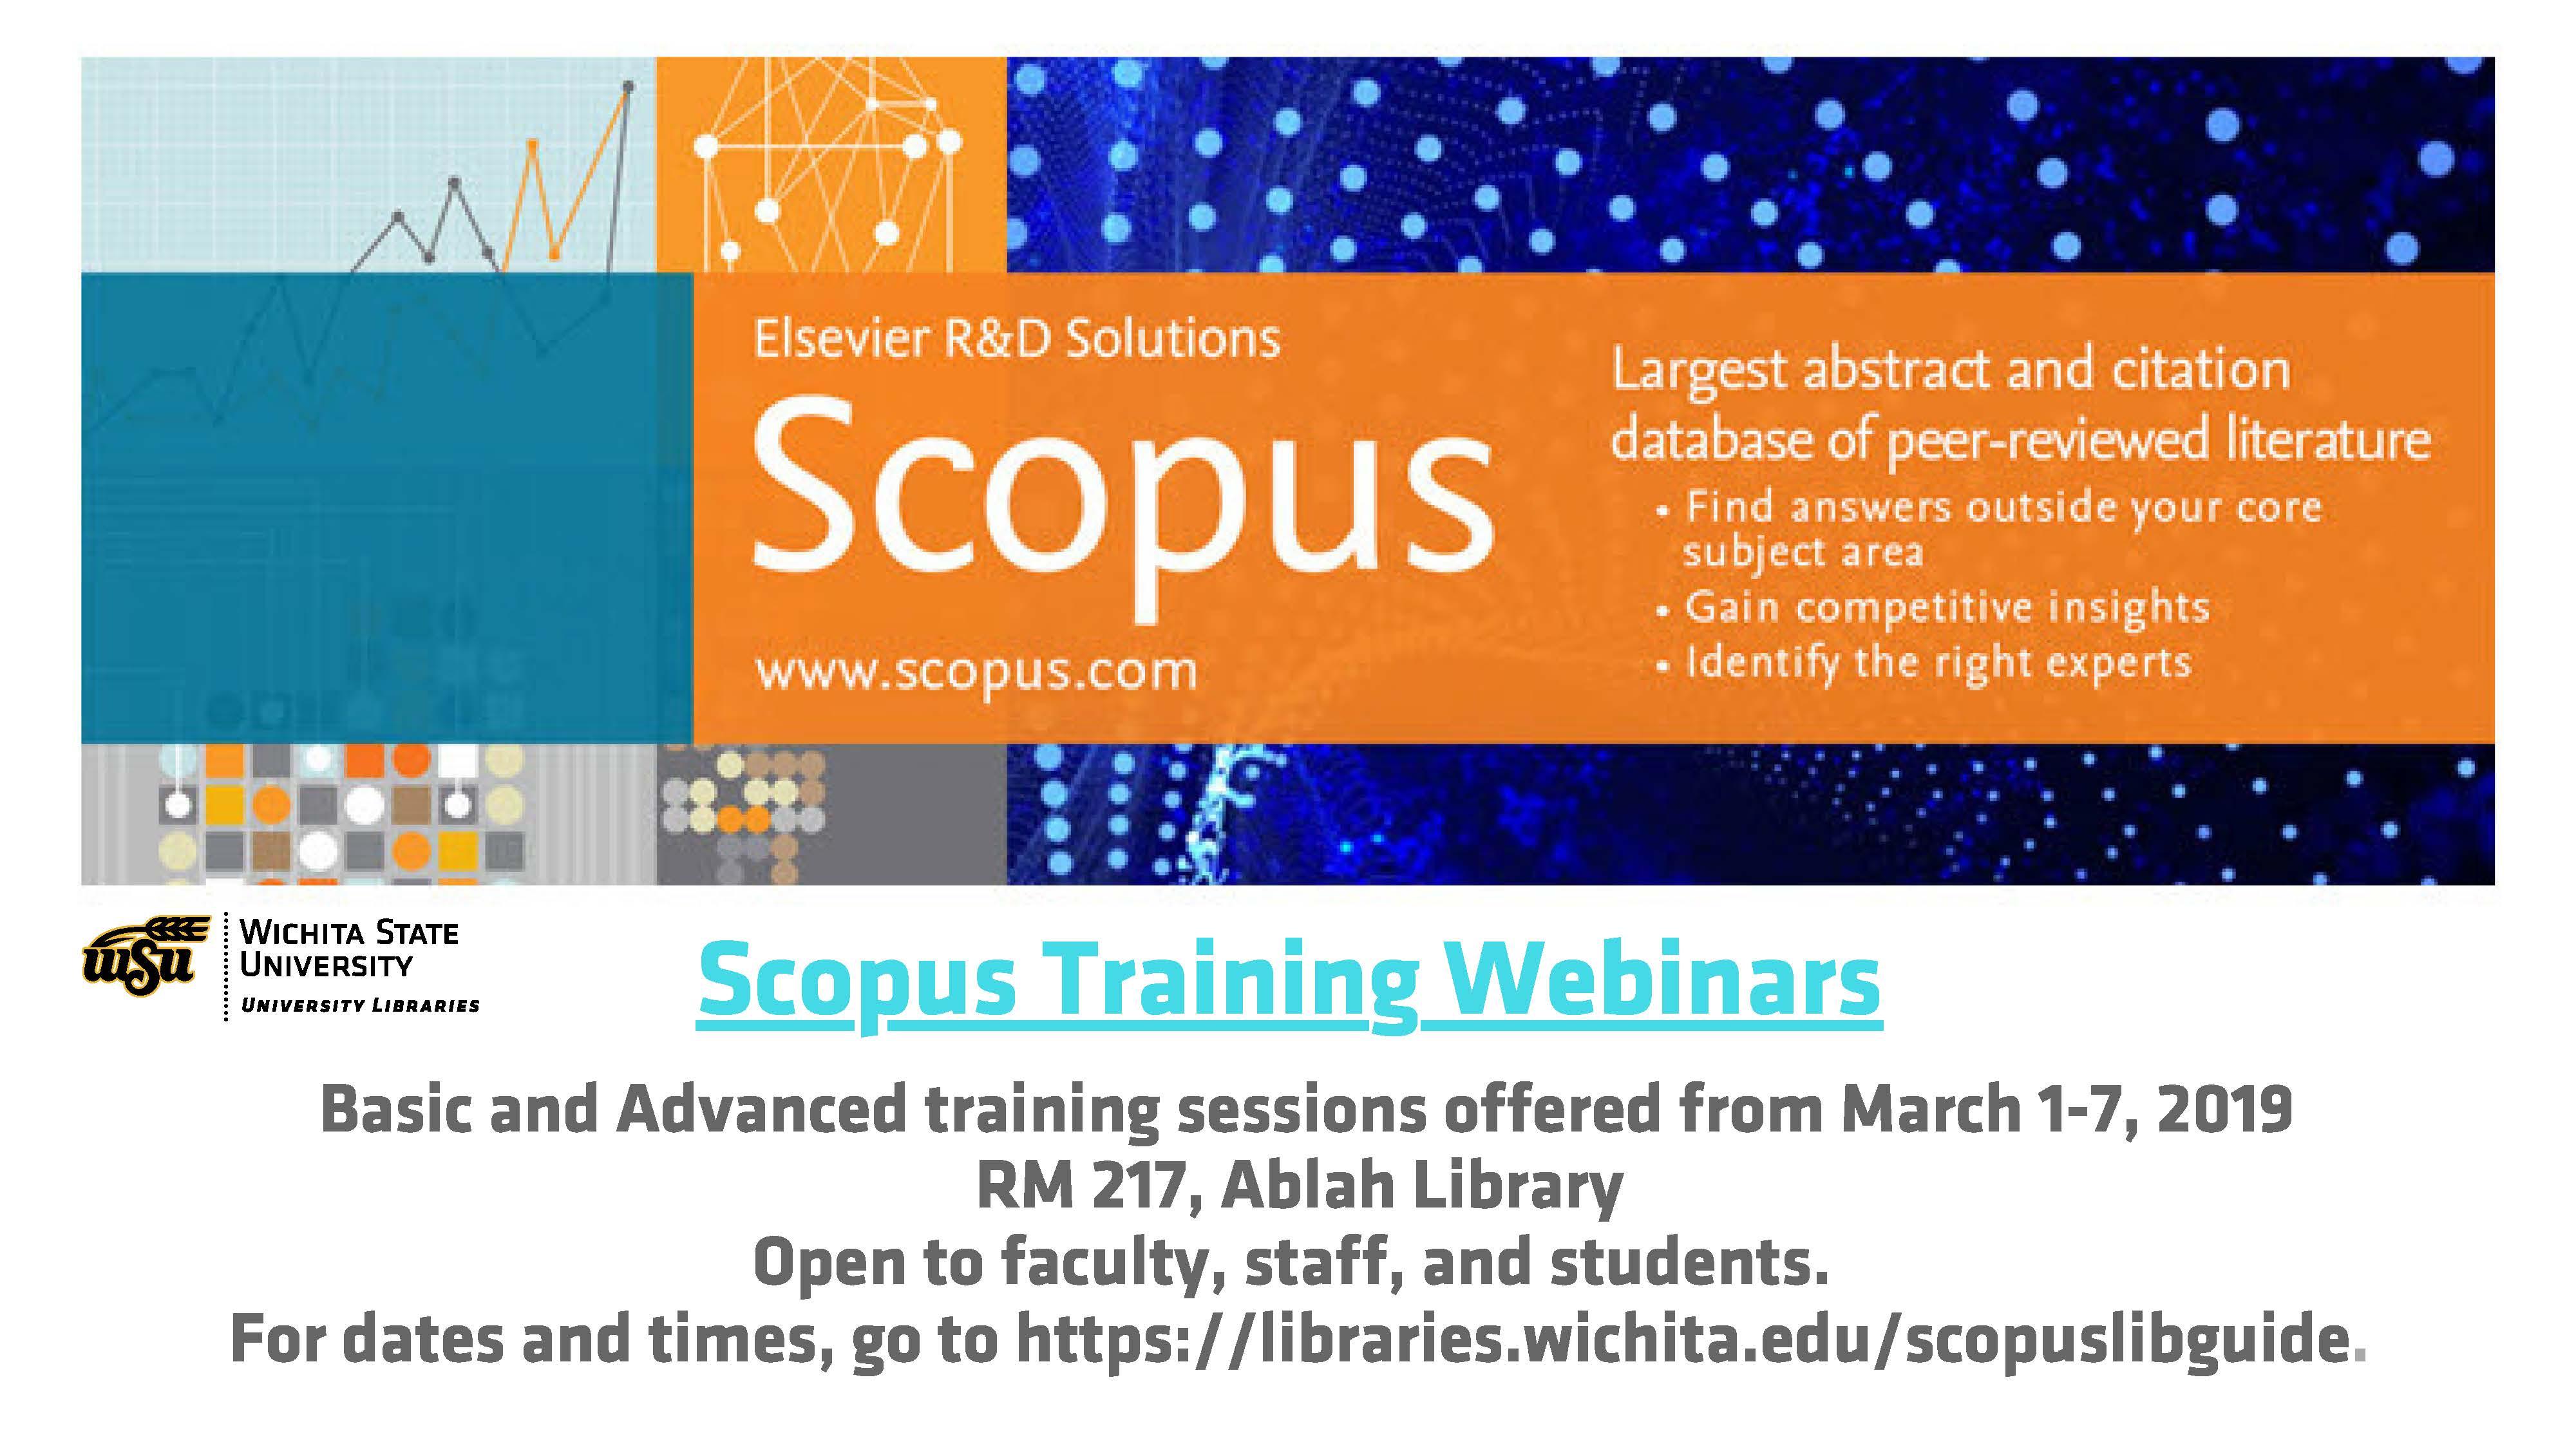 Scopus Webinar: The Basics